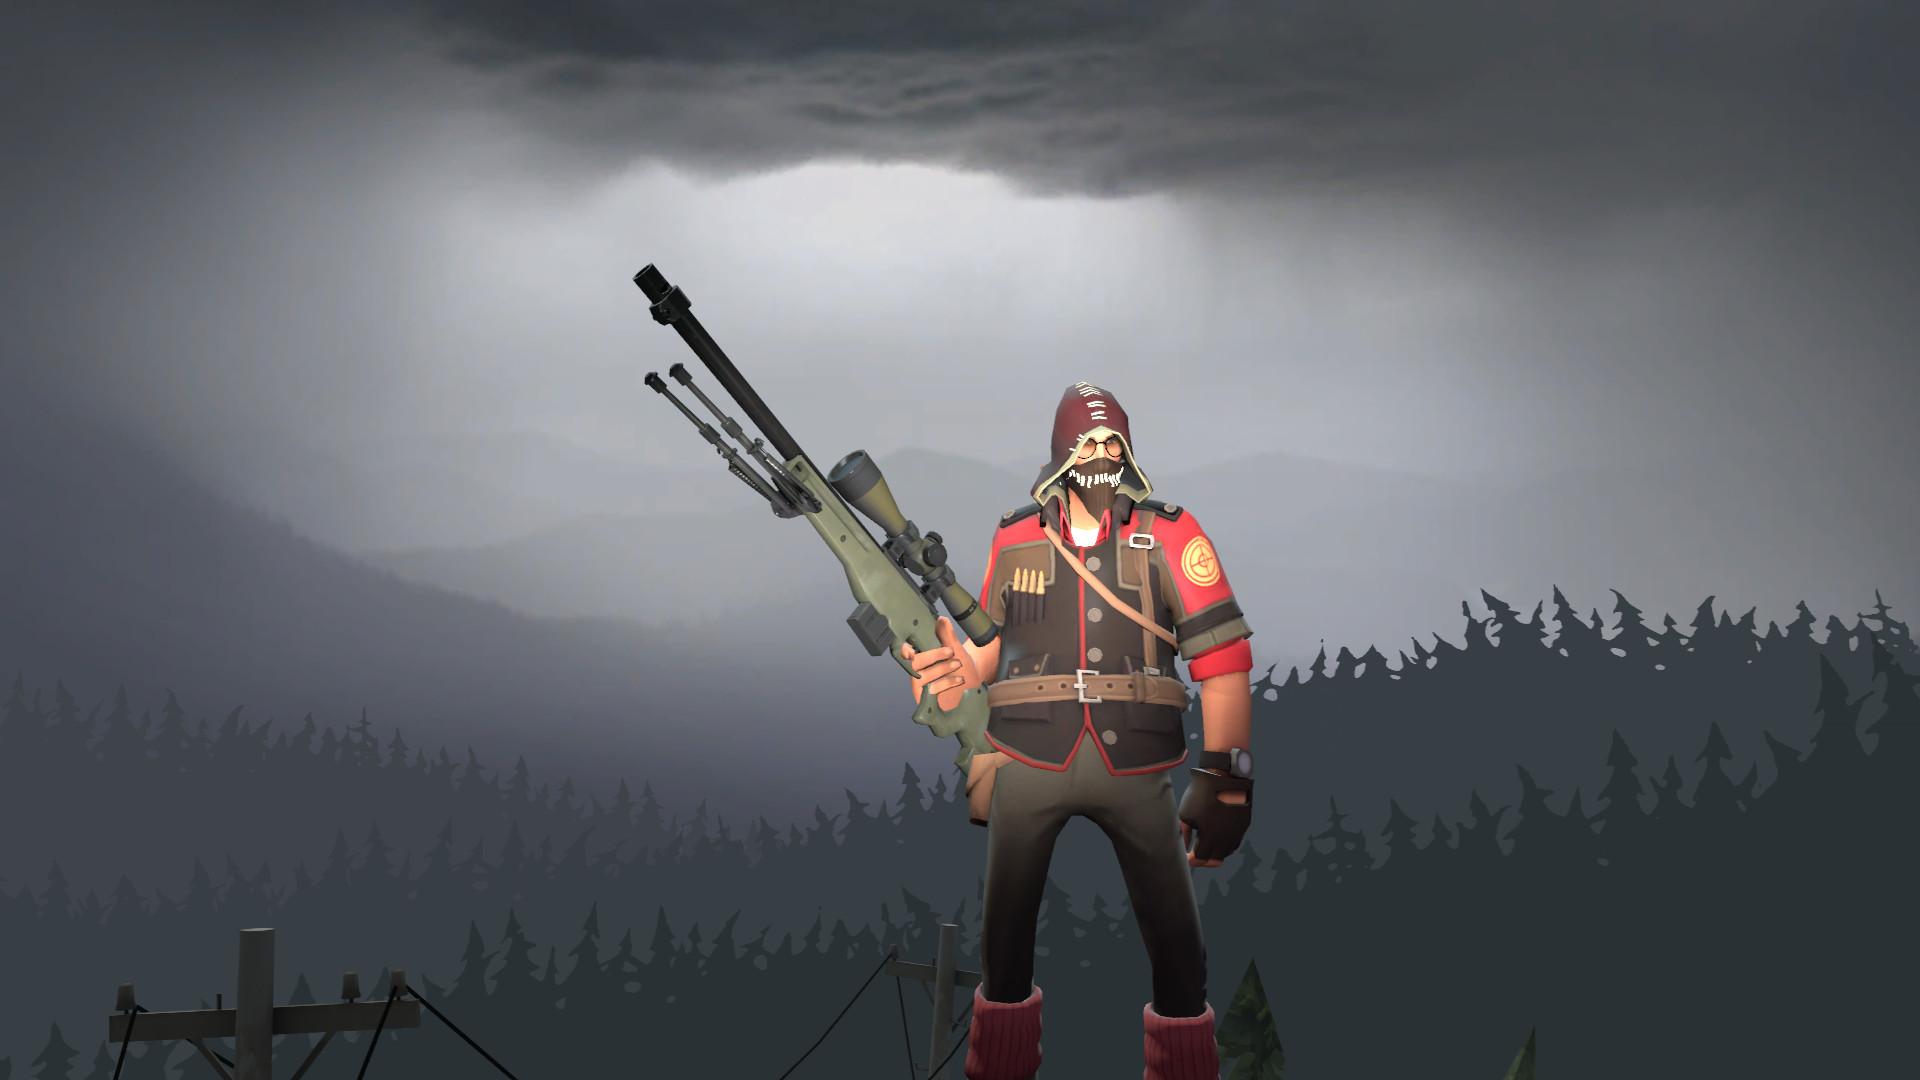 download meet the sniper hd